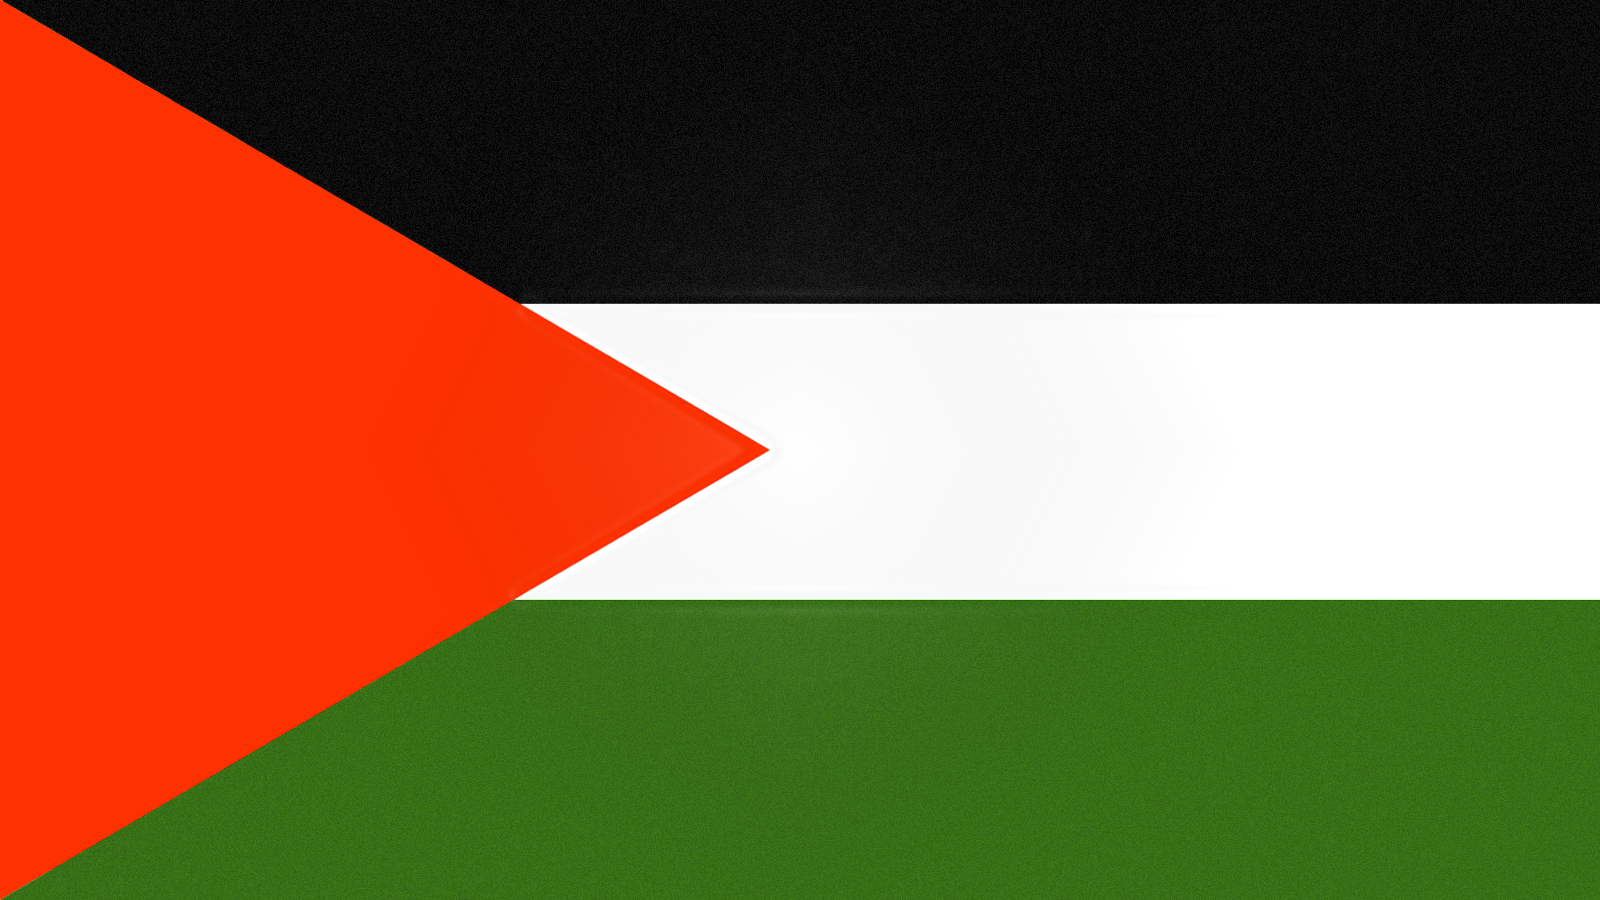 Images Of Hd Love Wallpapers Hd Wallpaper Download Original Palestine Flag Wide Hd